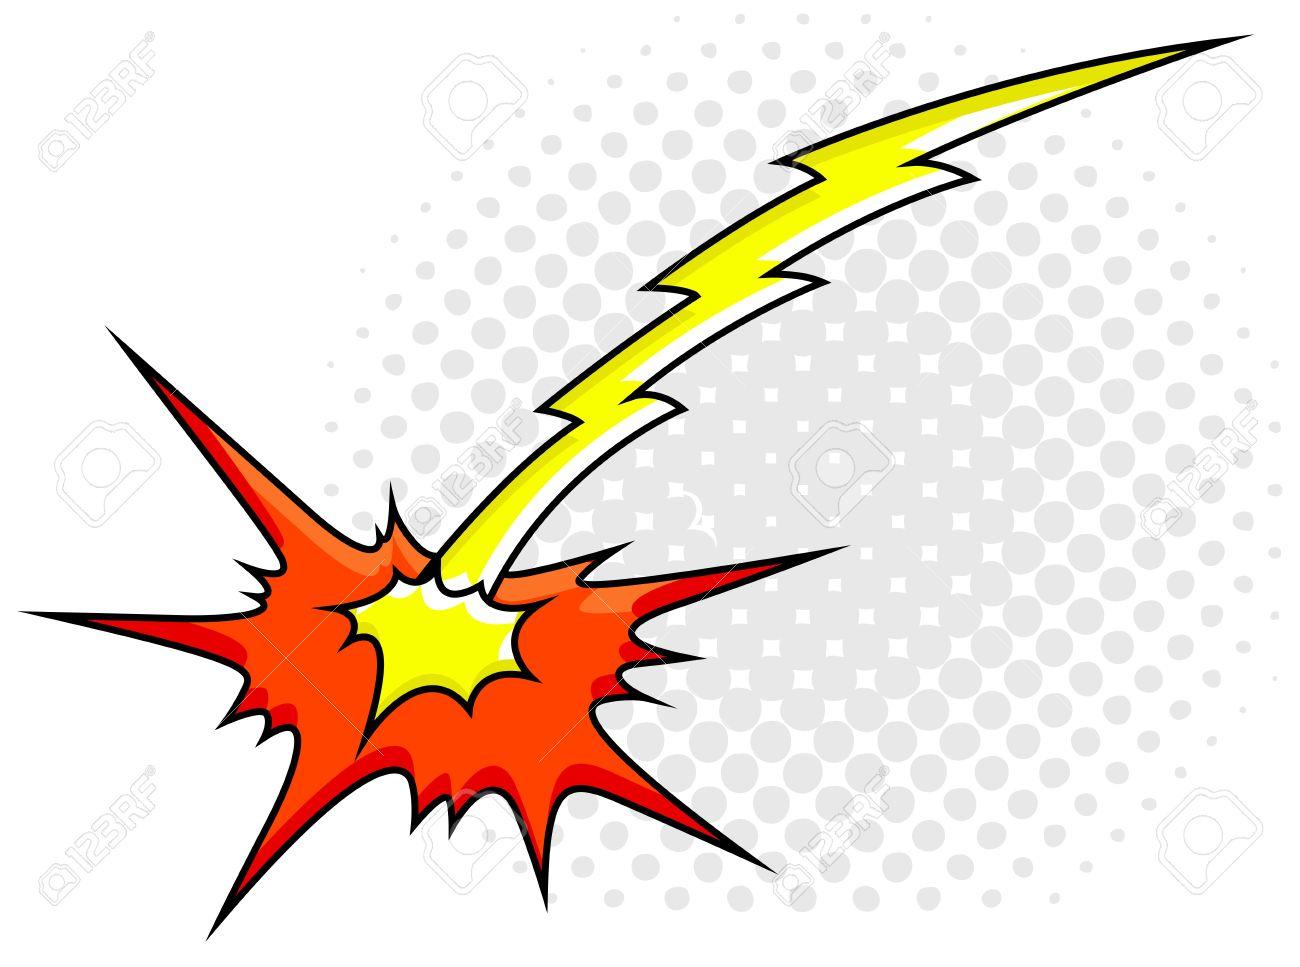 Comic Explosion Sparks Light Stock Vector - 19419746